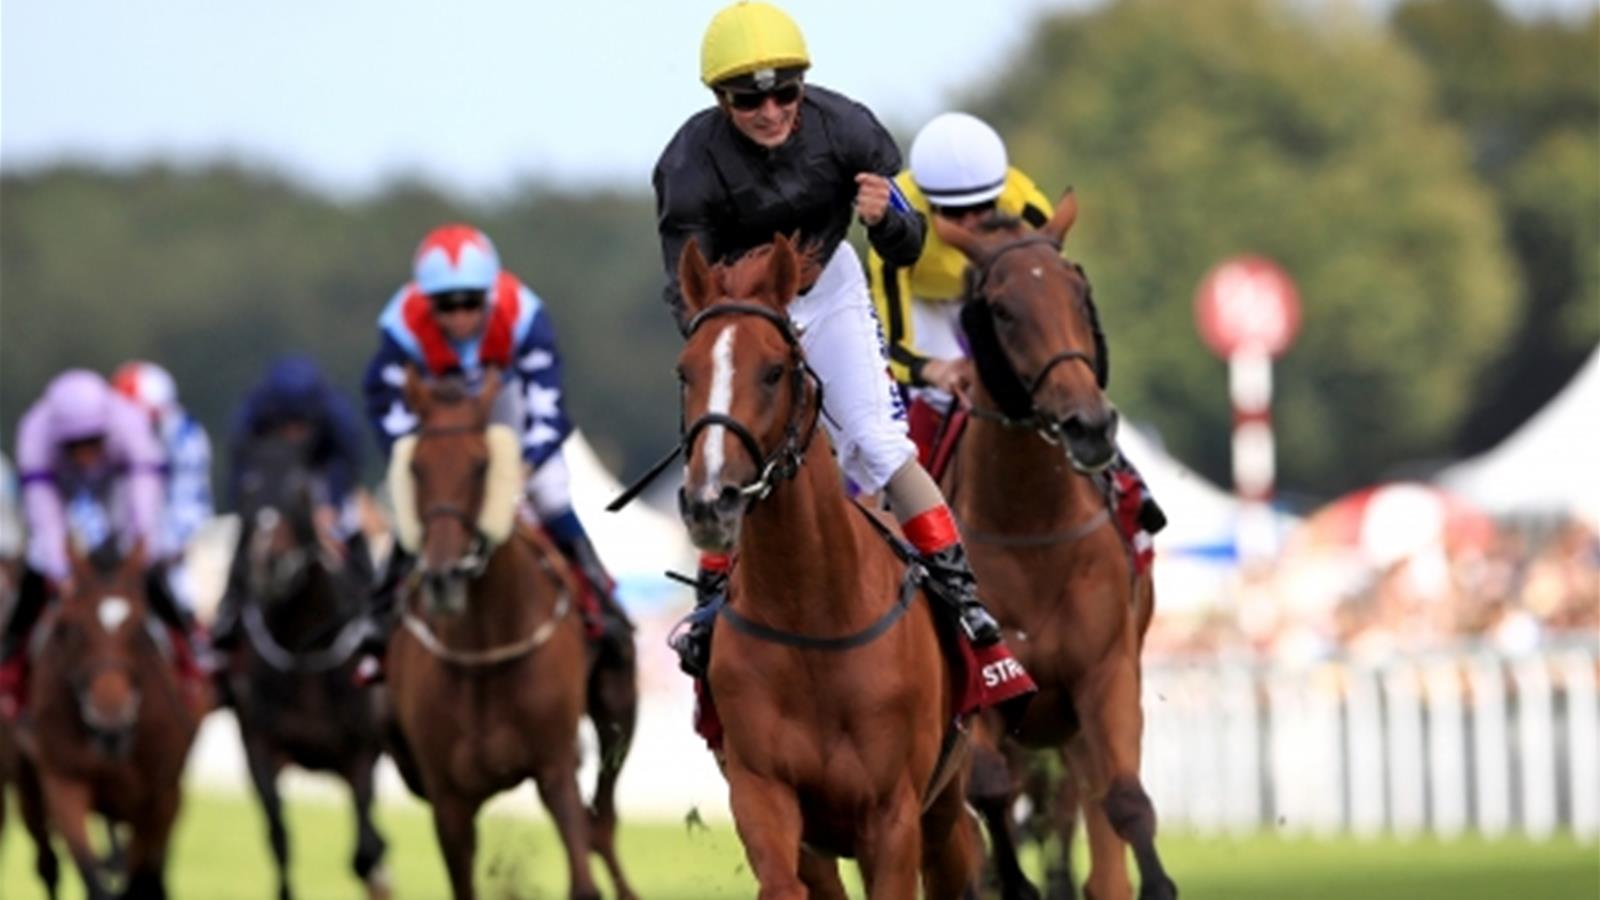 Stradivarius denies Big Orange as Atzeni rides four winners at Goodwood - Horse Racing - Eurosport